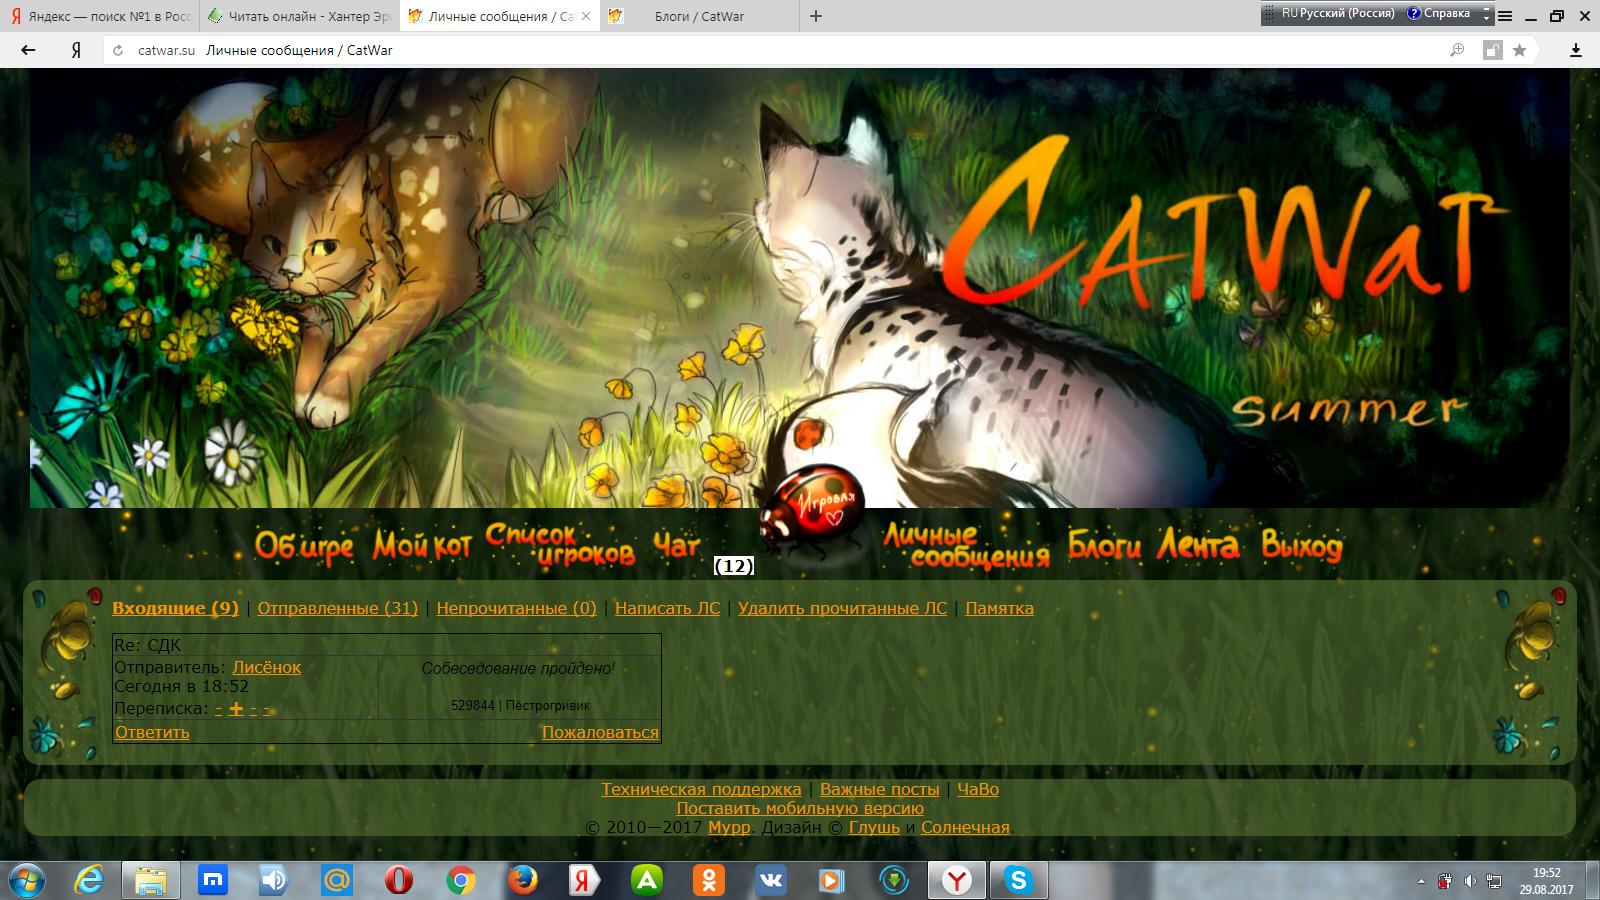 Дизайн CatWar вики FANDOM powered by Wikia